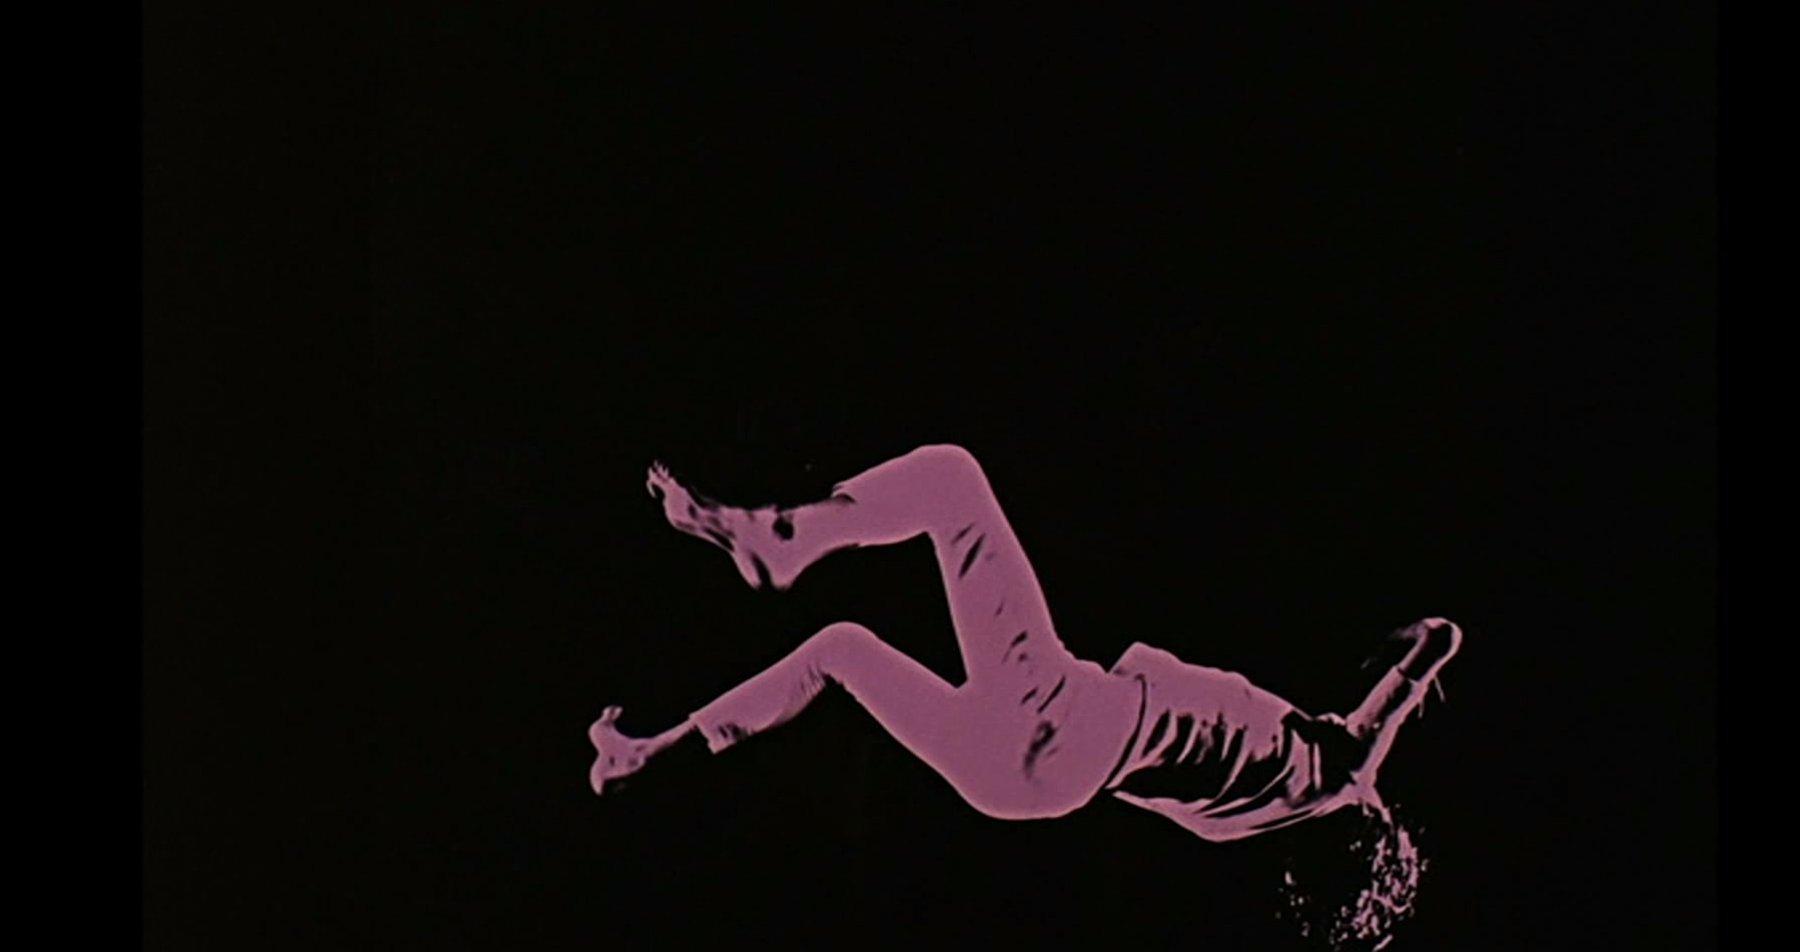 Кадр из фильма «Квадрат» Збигнева Рыбчинского, фото: FilmPolski.pl